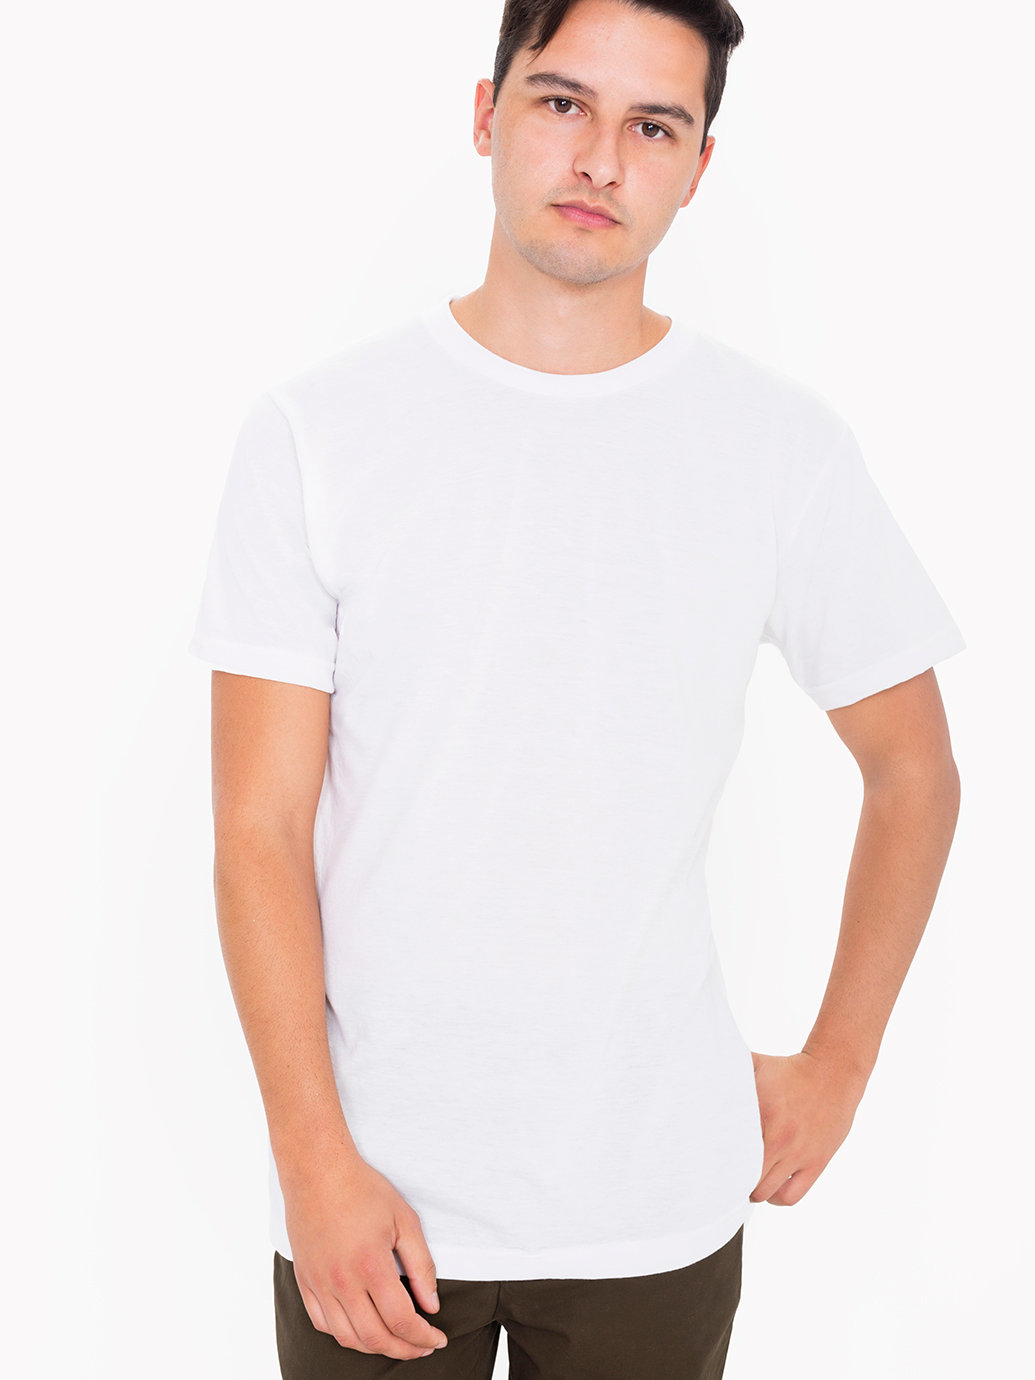 American apparel fine jersey crewneck pocket t shirt in for American apparel fine jersey crewneck t shirt